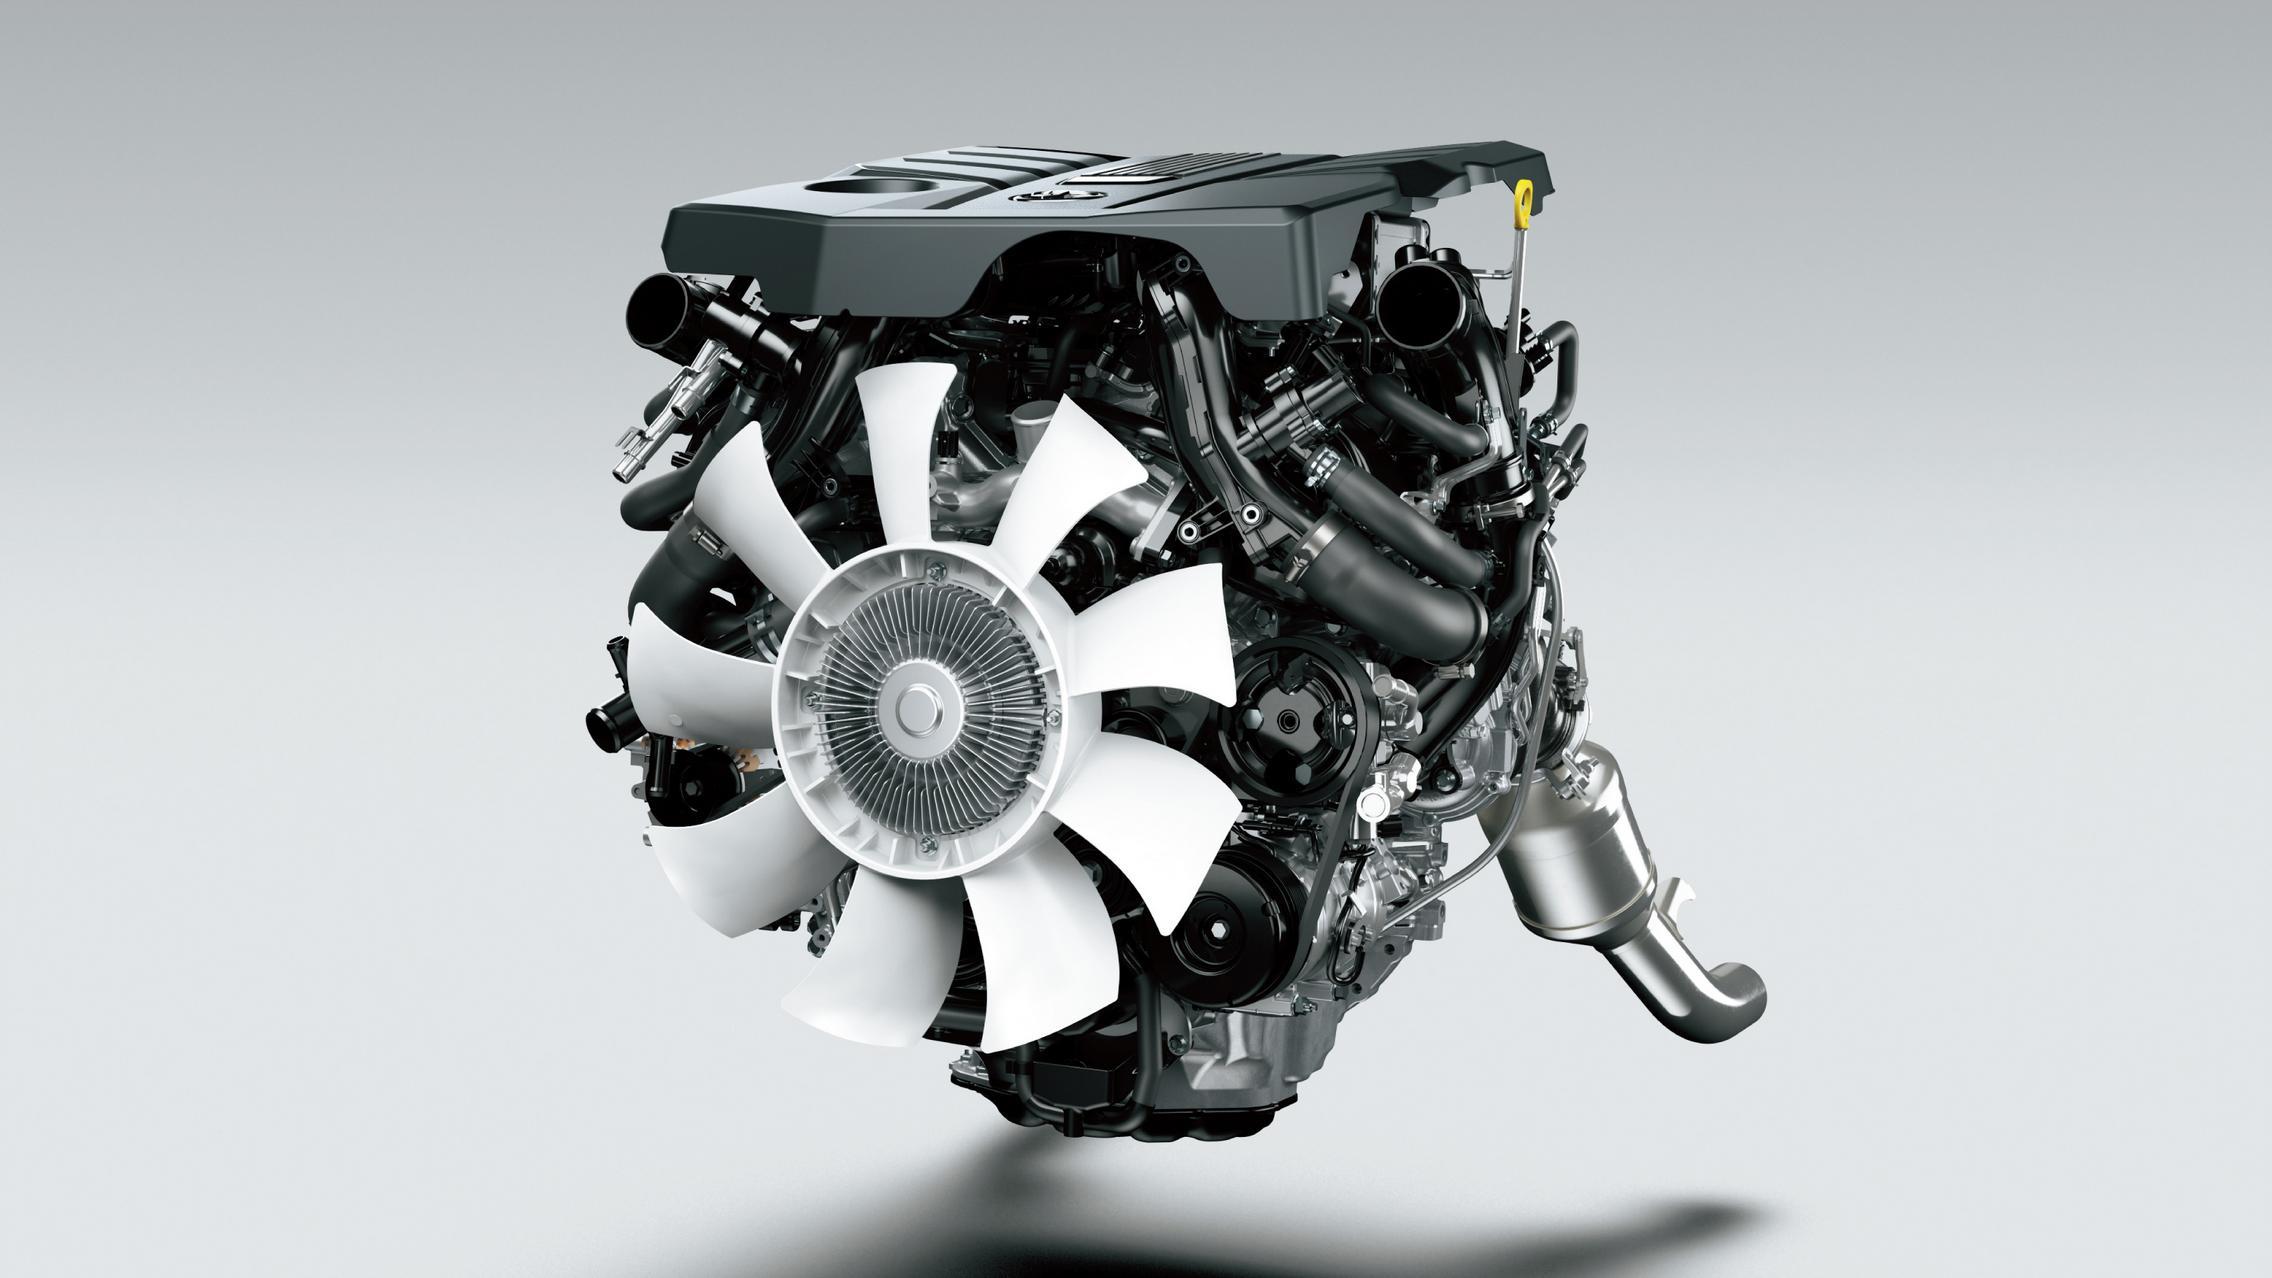 Land Cruiser 300 engine